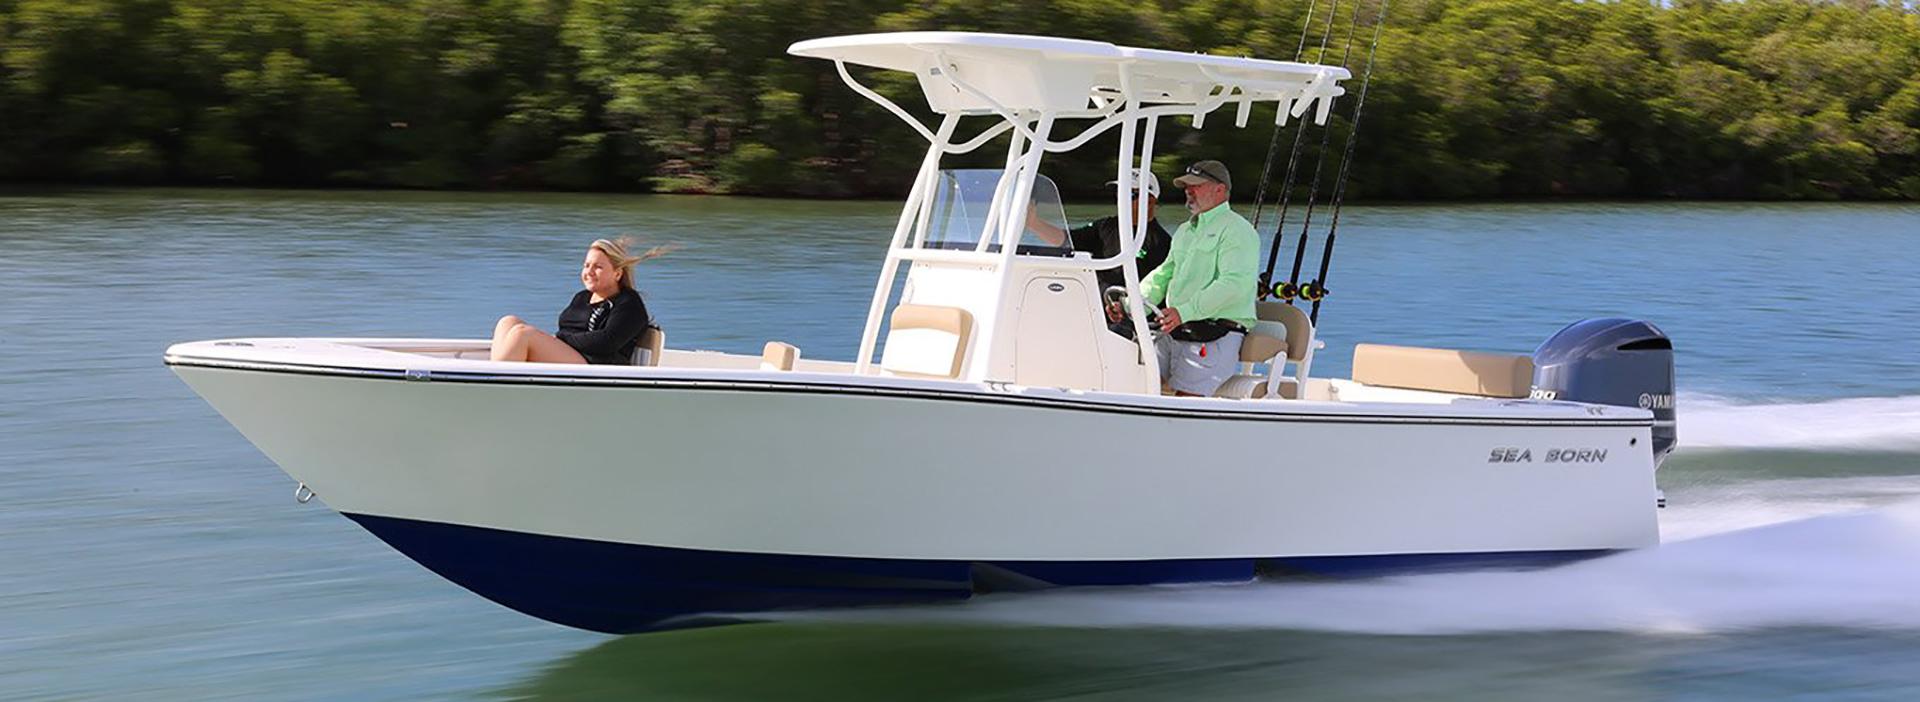 Sea Born Boat Gregg Orr Marine